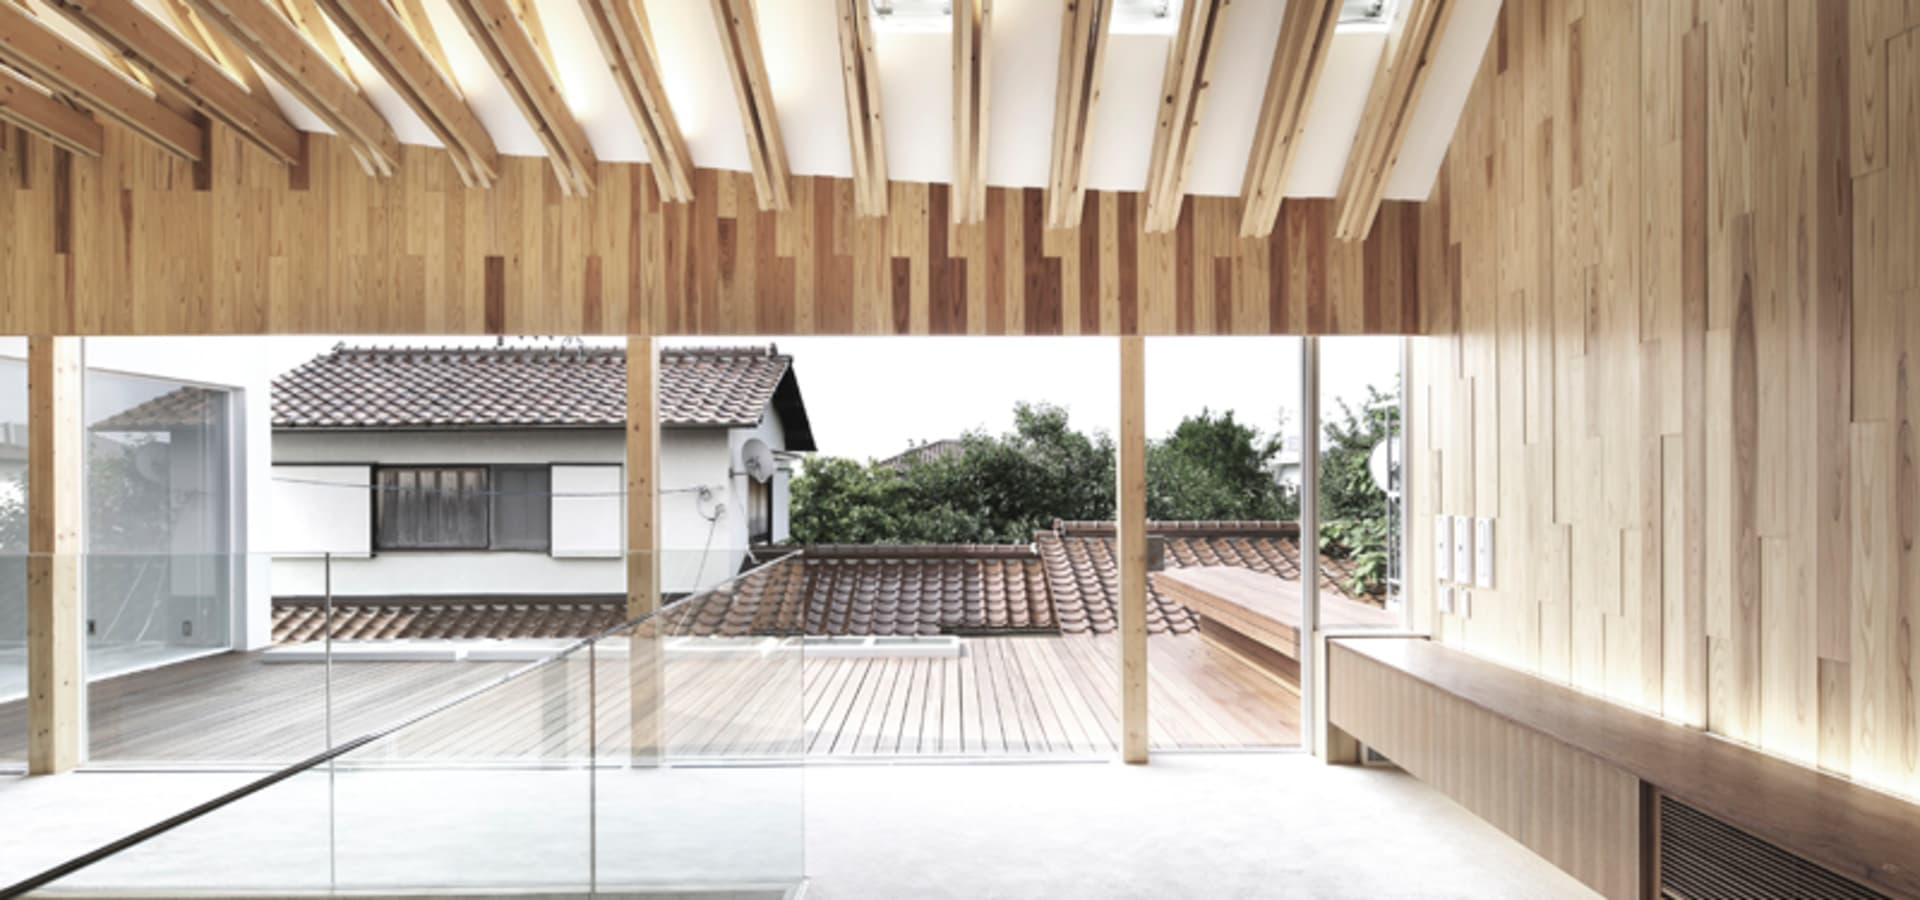 Osaka kohki hiranuma architect associates - Innen und auayen architektur ...